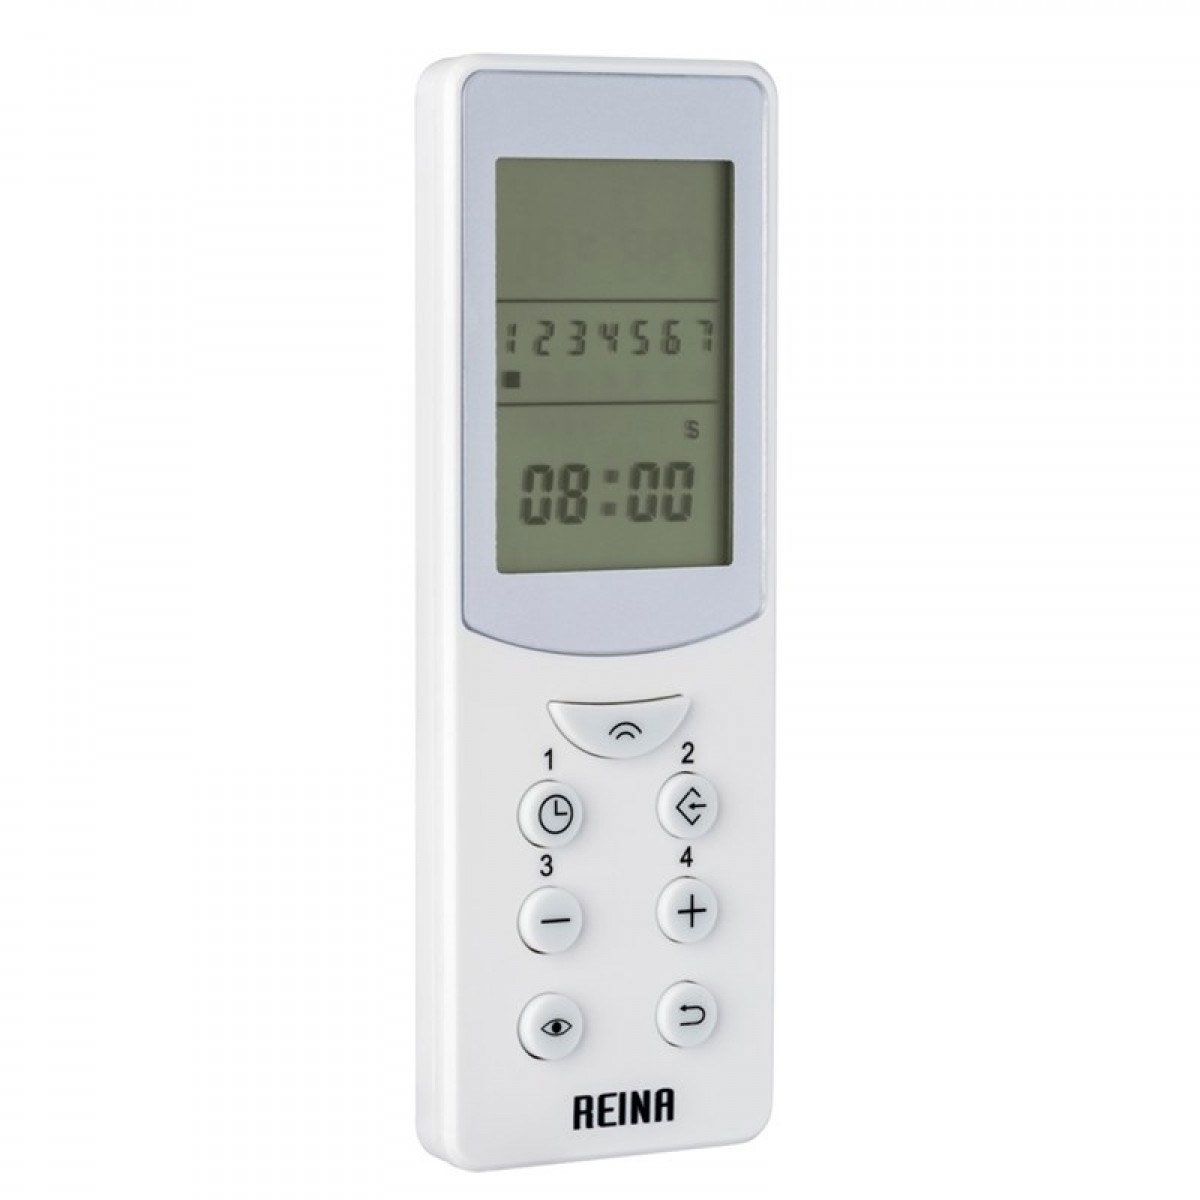 Reina Capo Straight Thermostatic Electric Heated Towel Rail 1600mm H x 600mm W Chrome